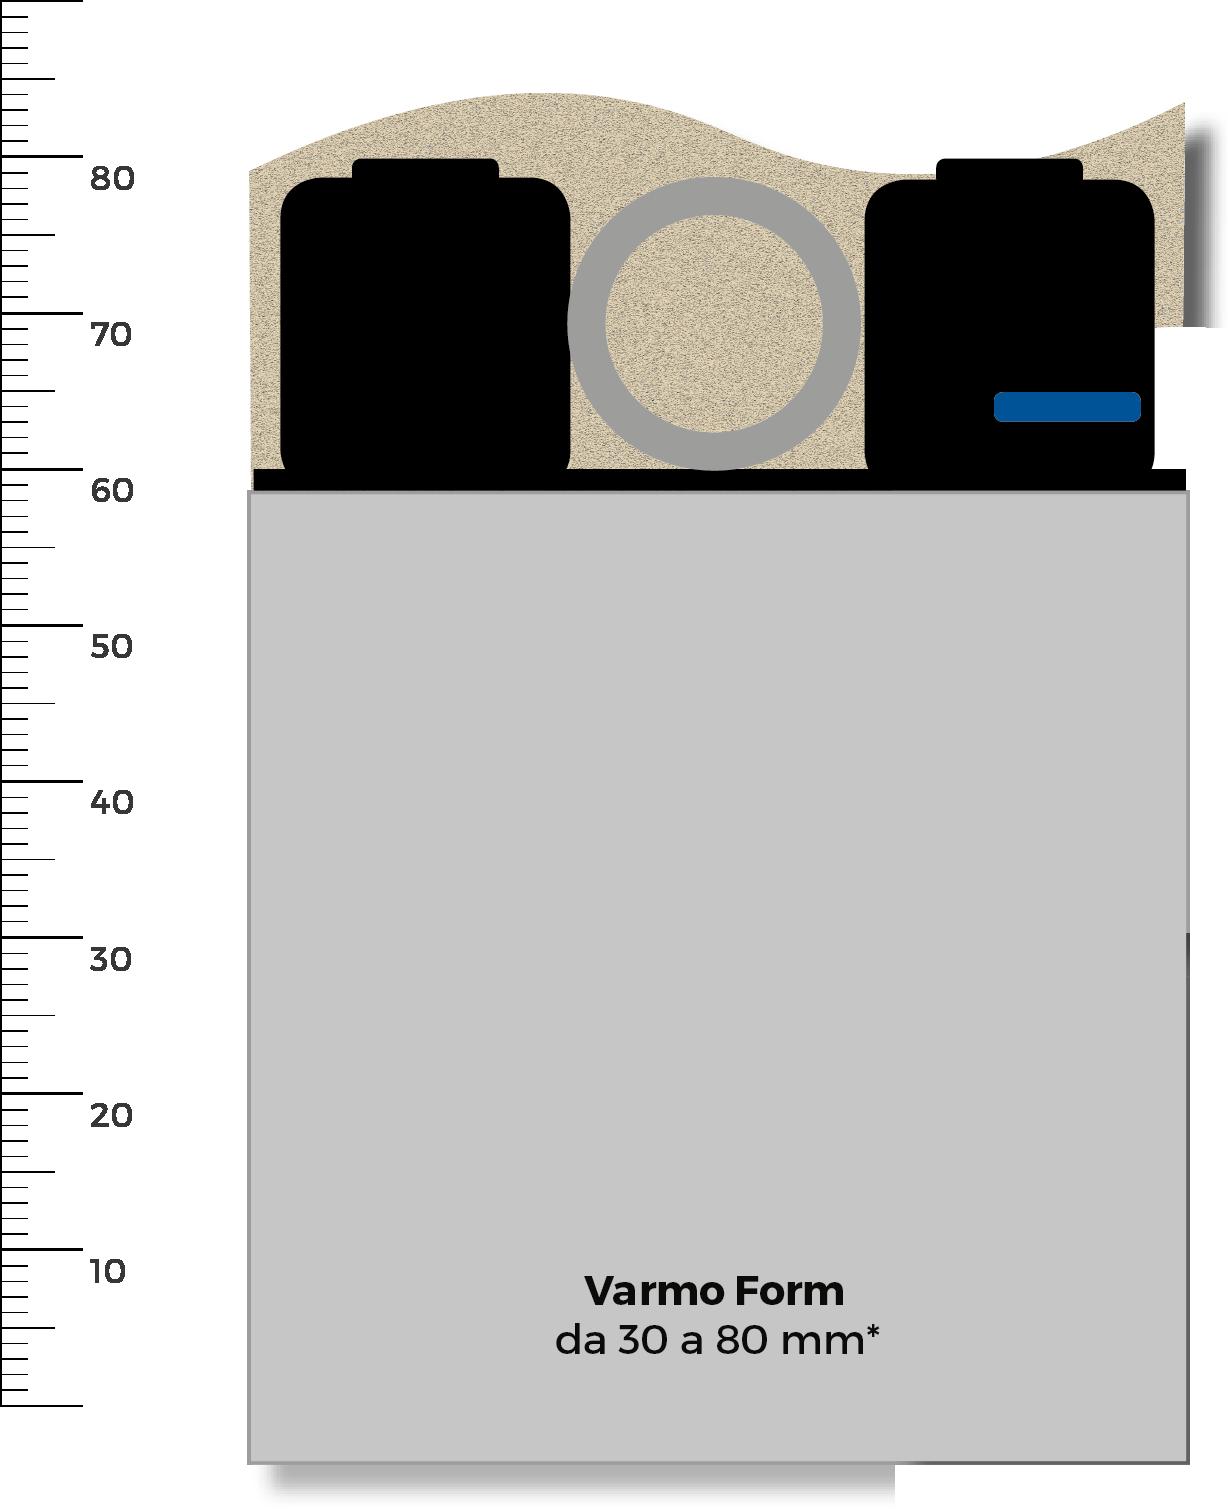 VARMO_FORM_768X400.png